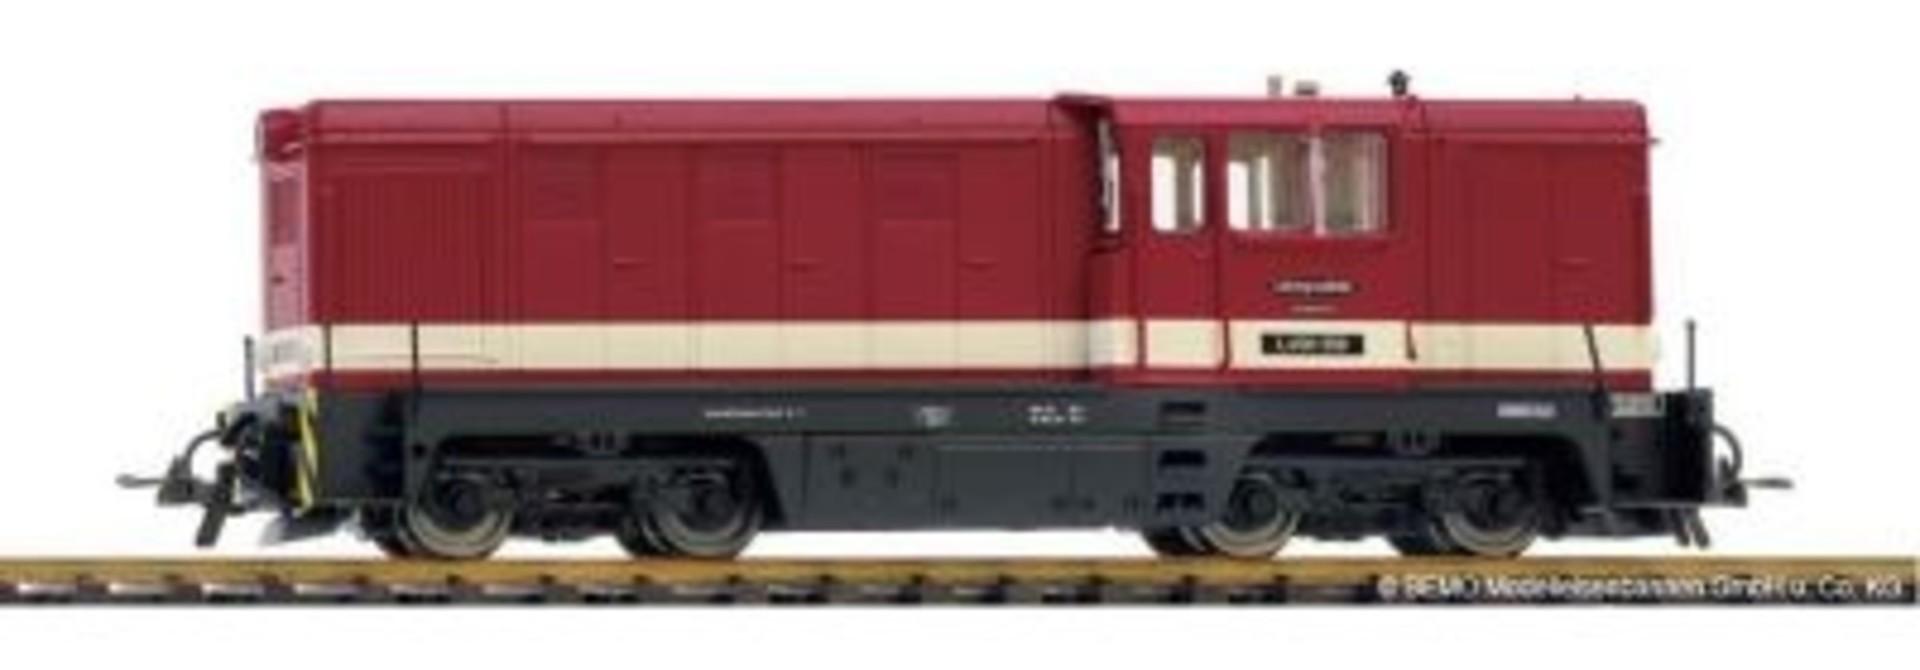 1020875 SDG L45H-358 Lößnitzgrundbahn rot